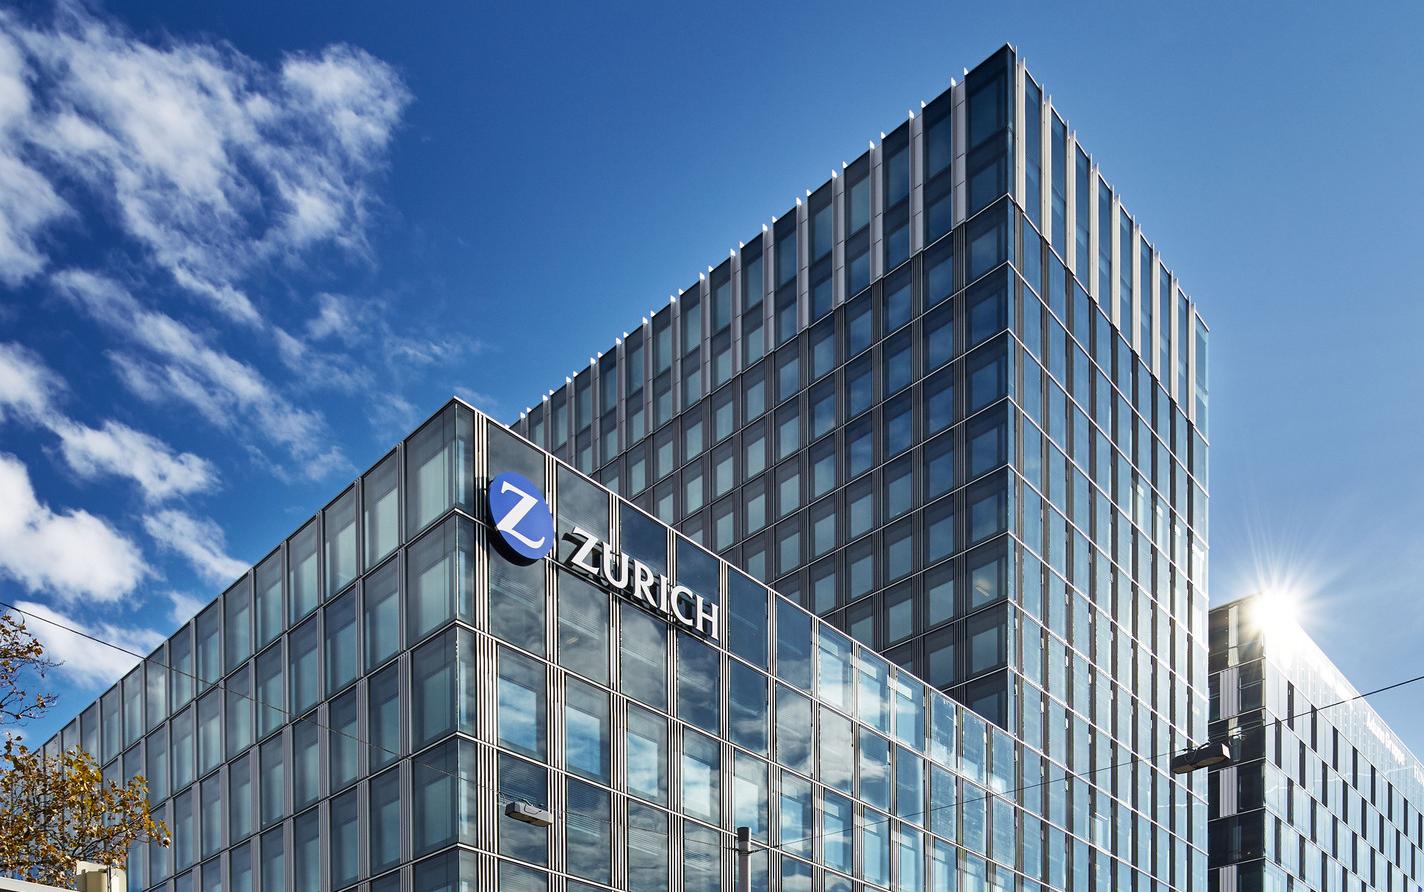 Zurich – COVID-19 Case Study